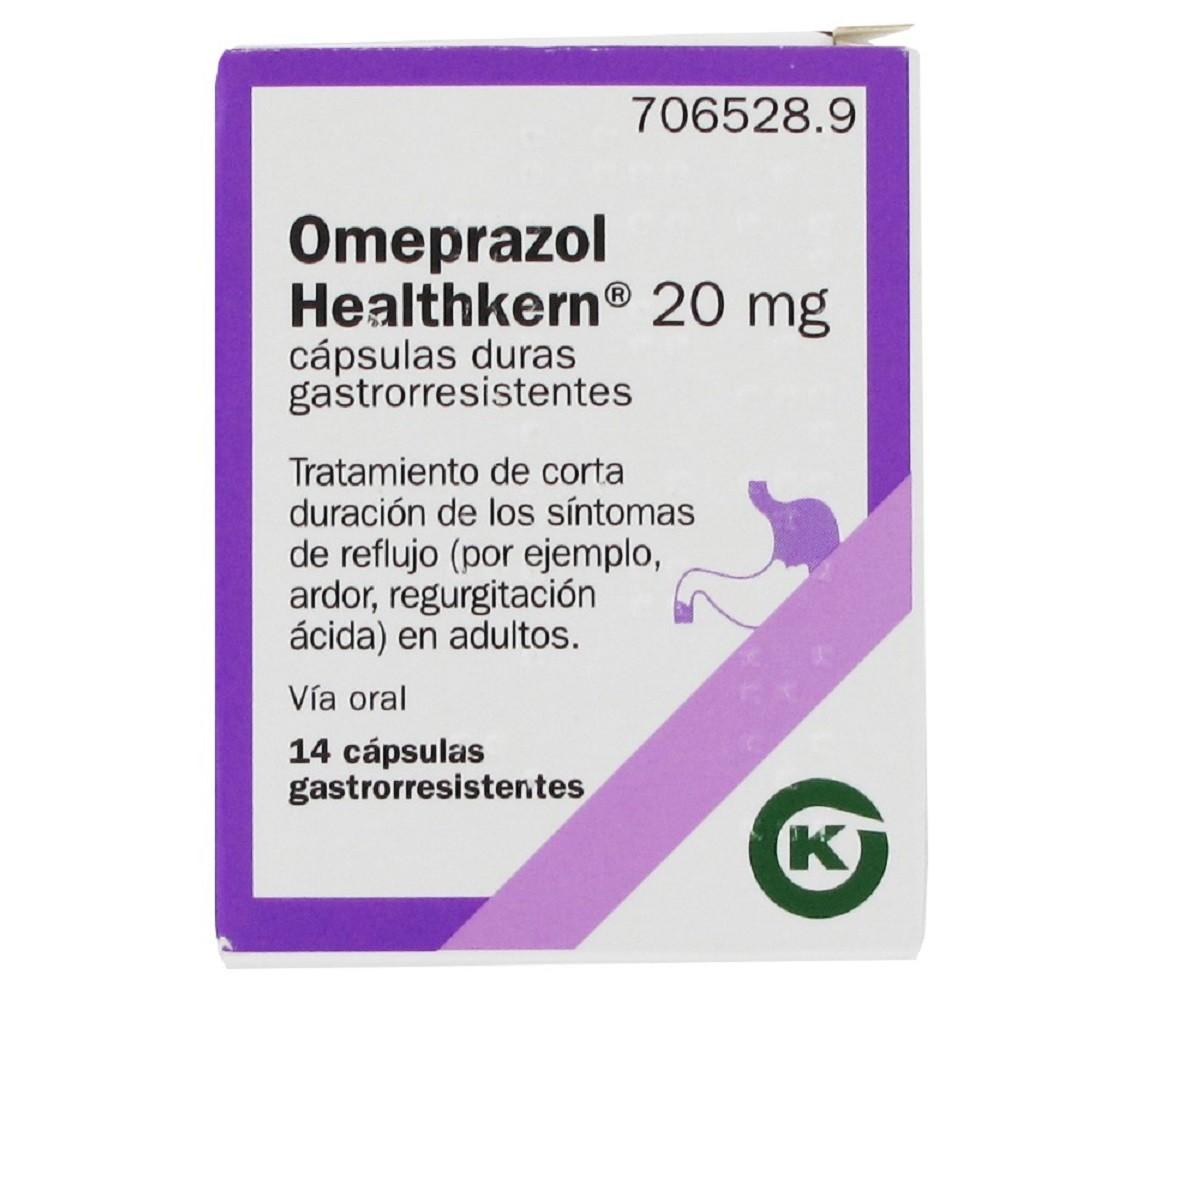 ¿Cuándo debo tomar Omeprazol?